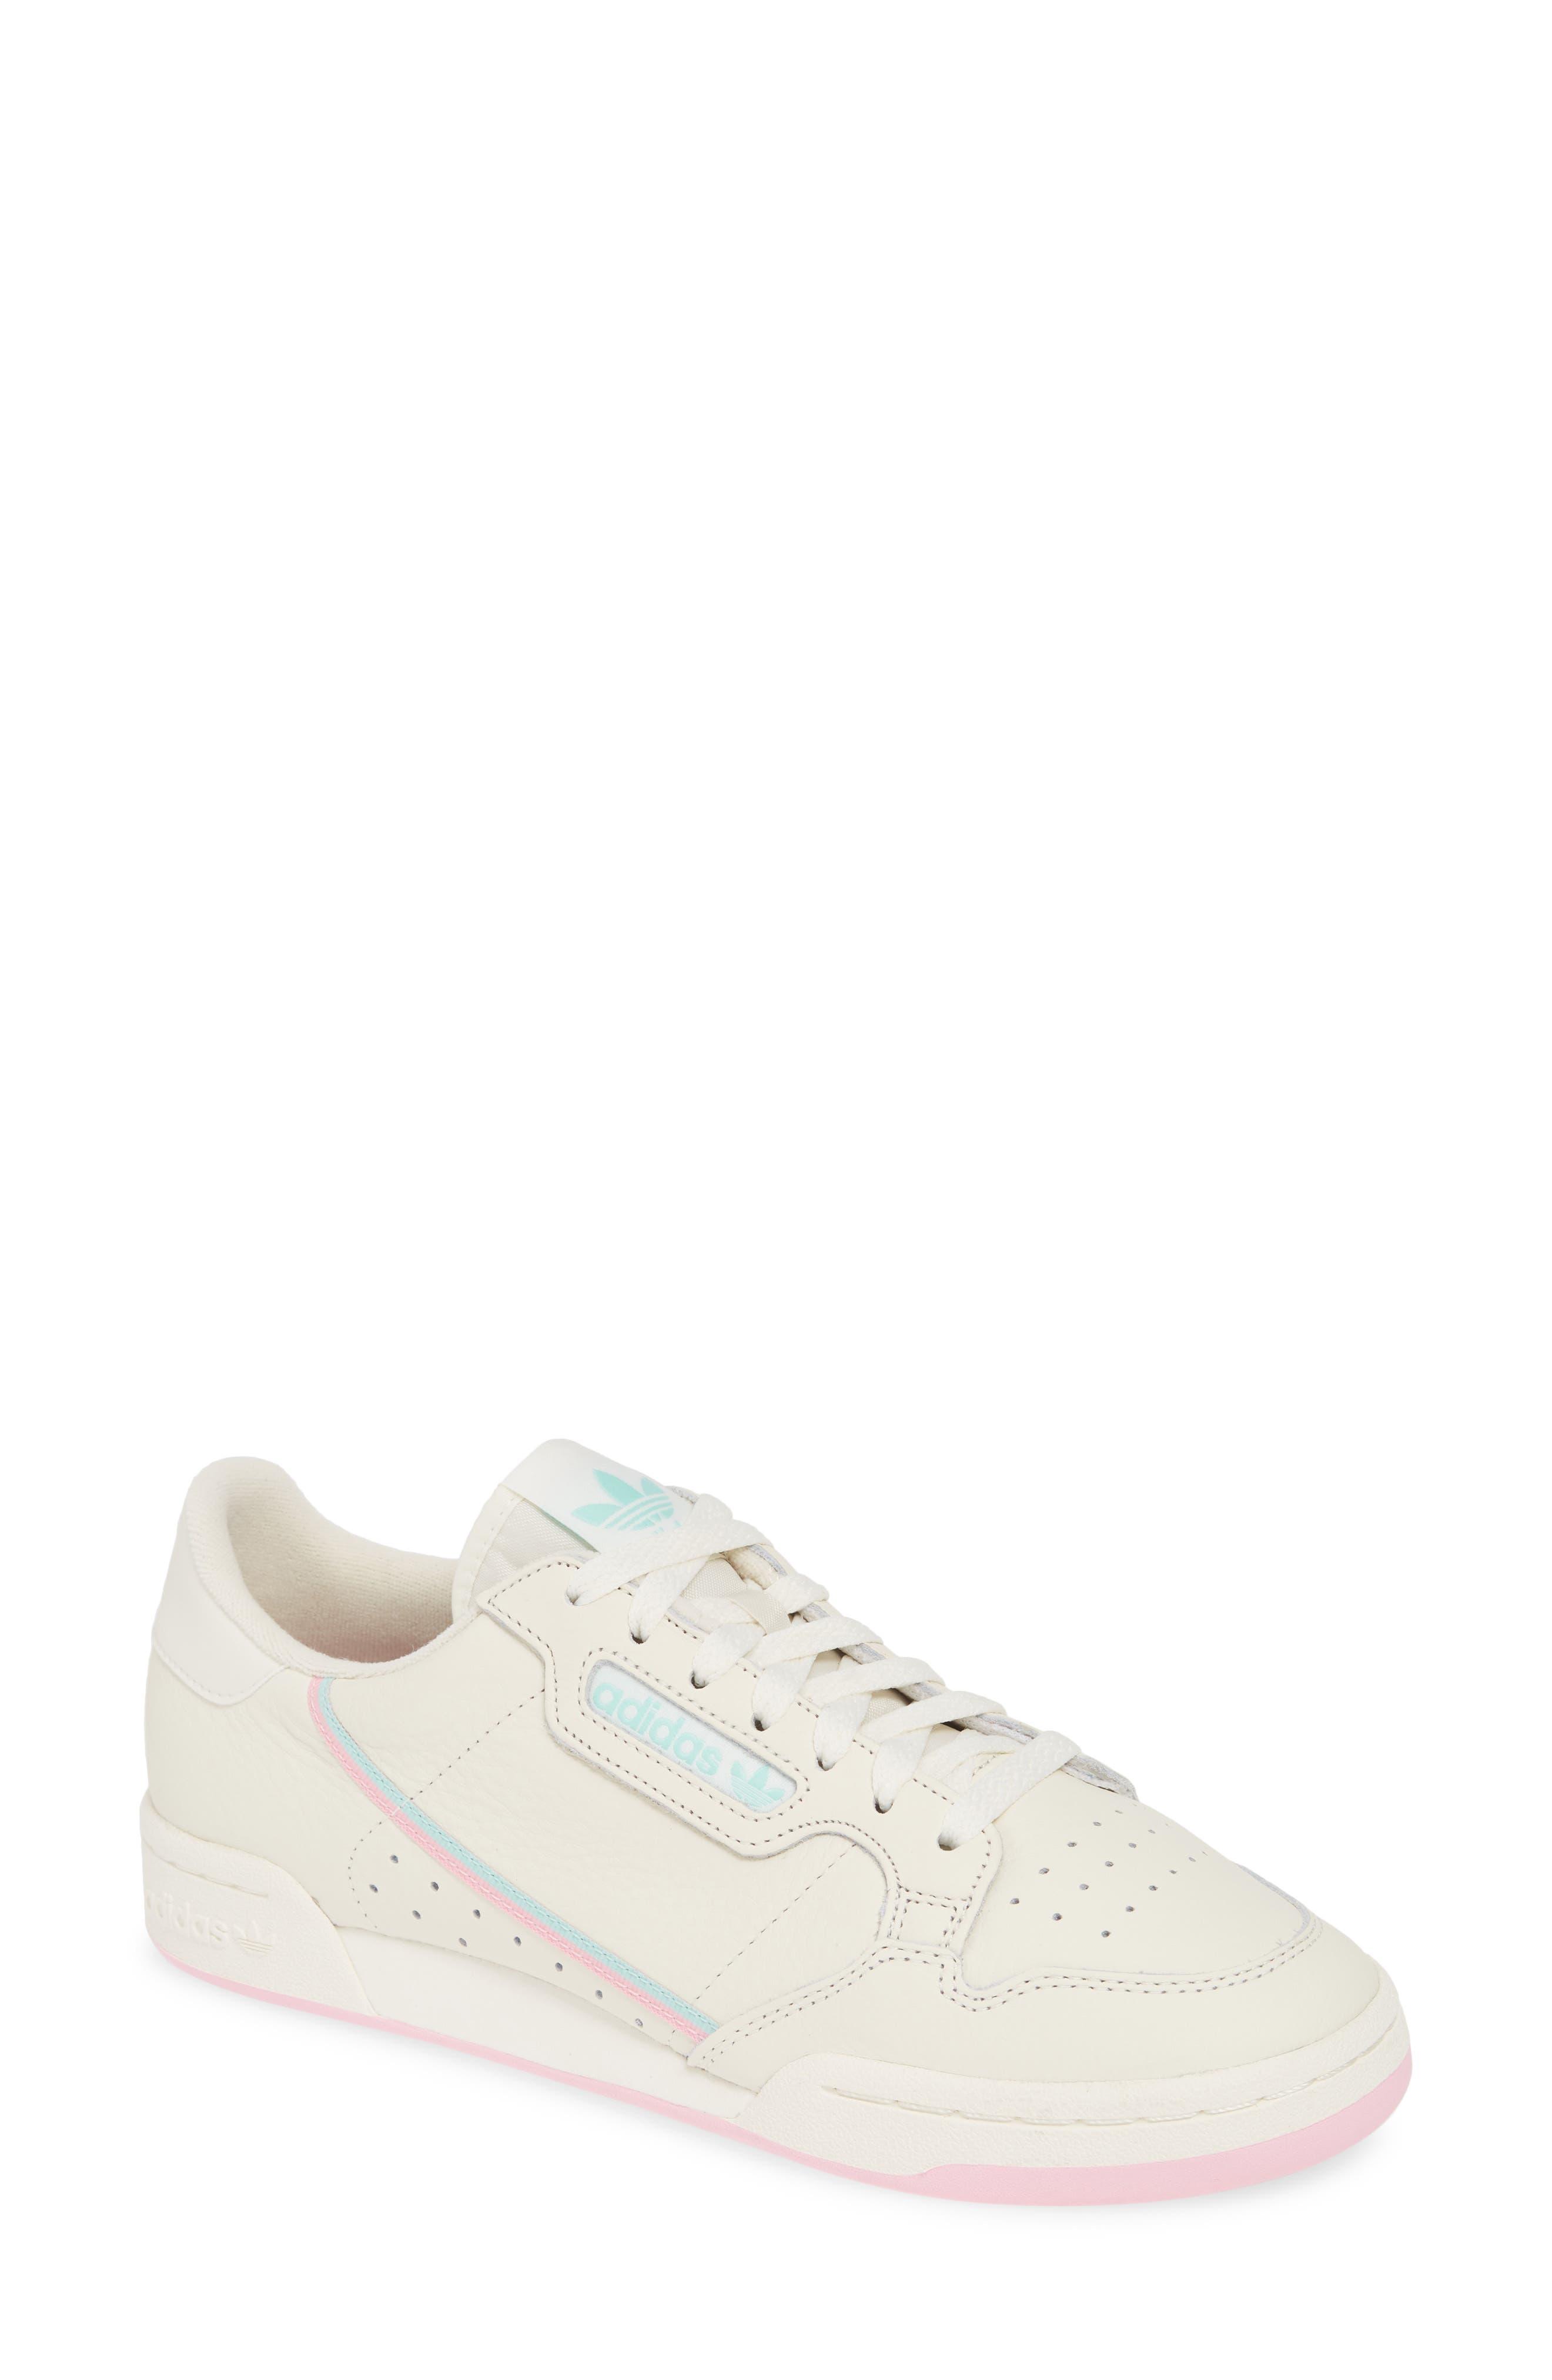 Adidas Continental 80 Sneaker, / 5 Men